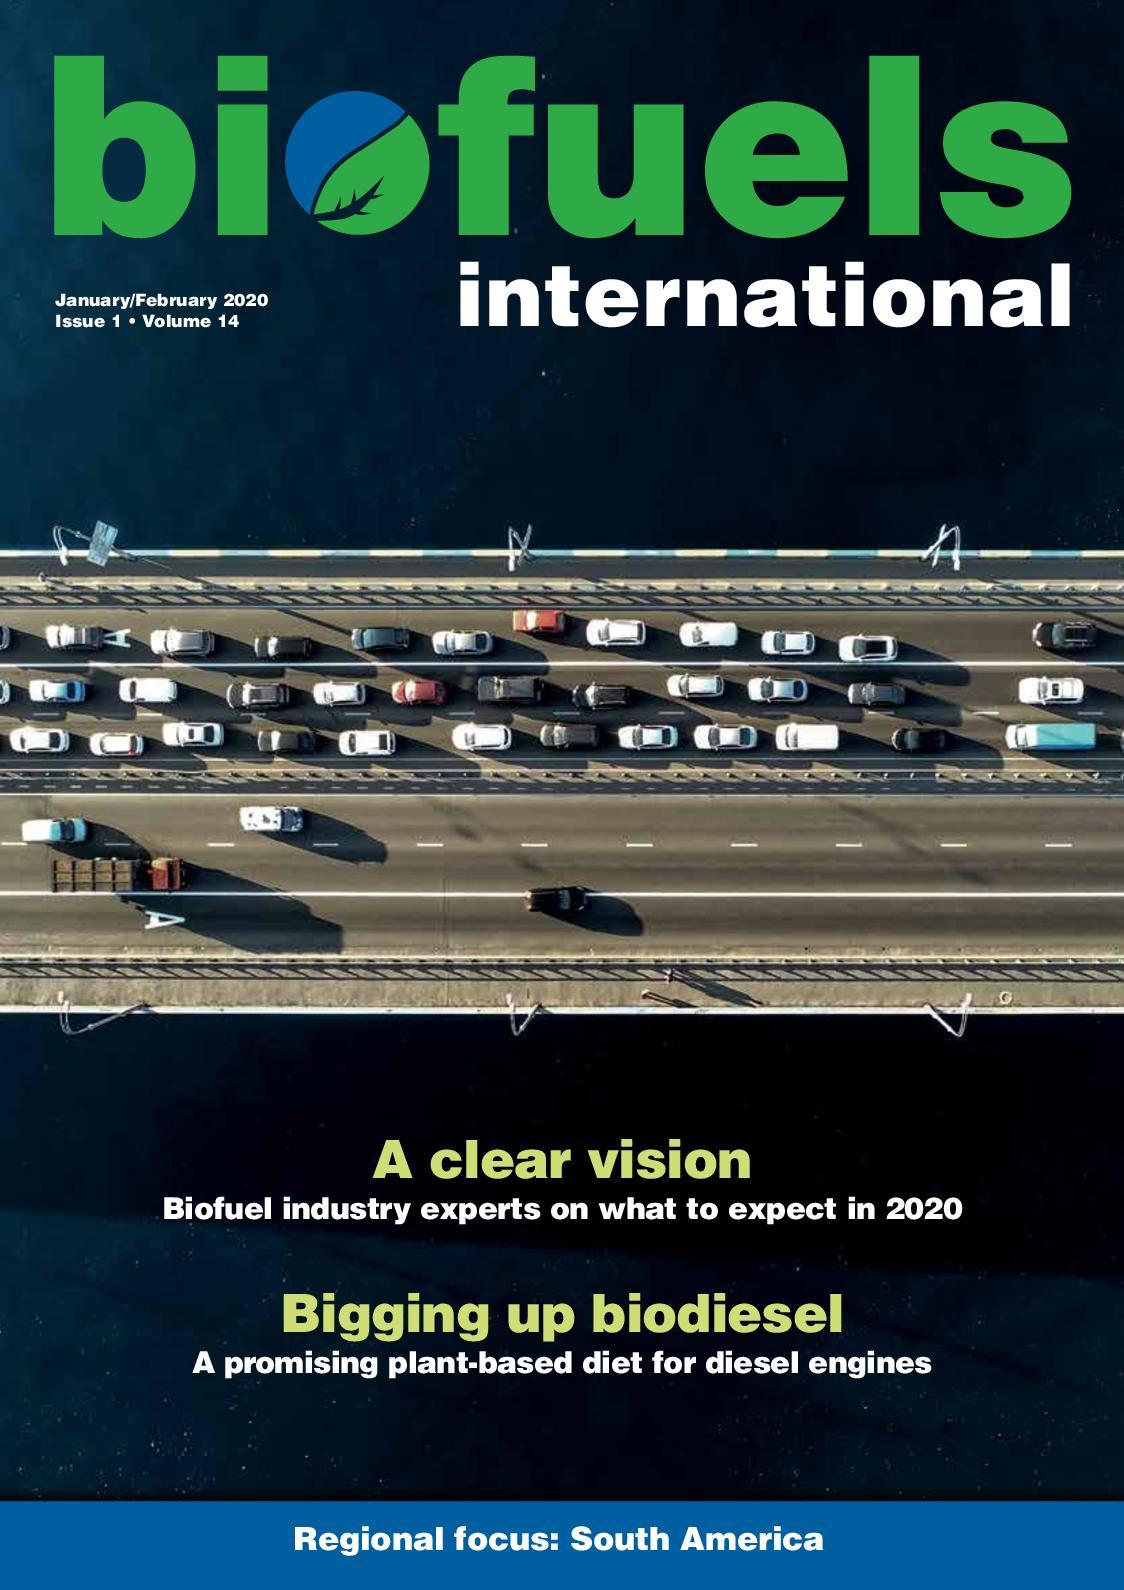 Calameo Biofuels International January February 2020